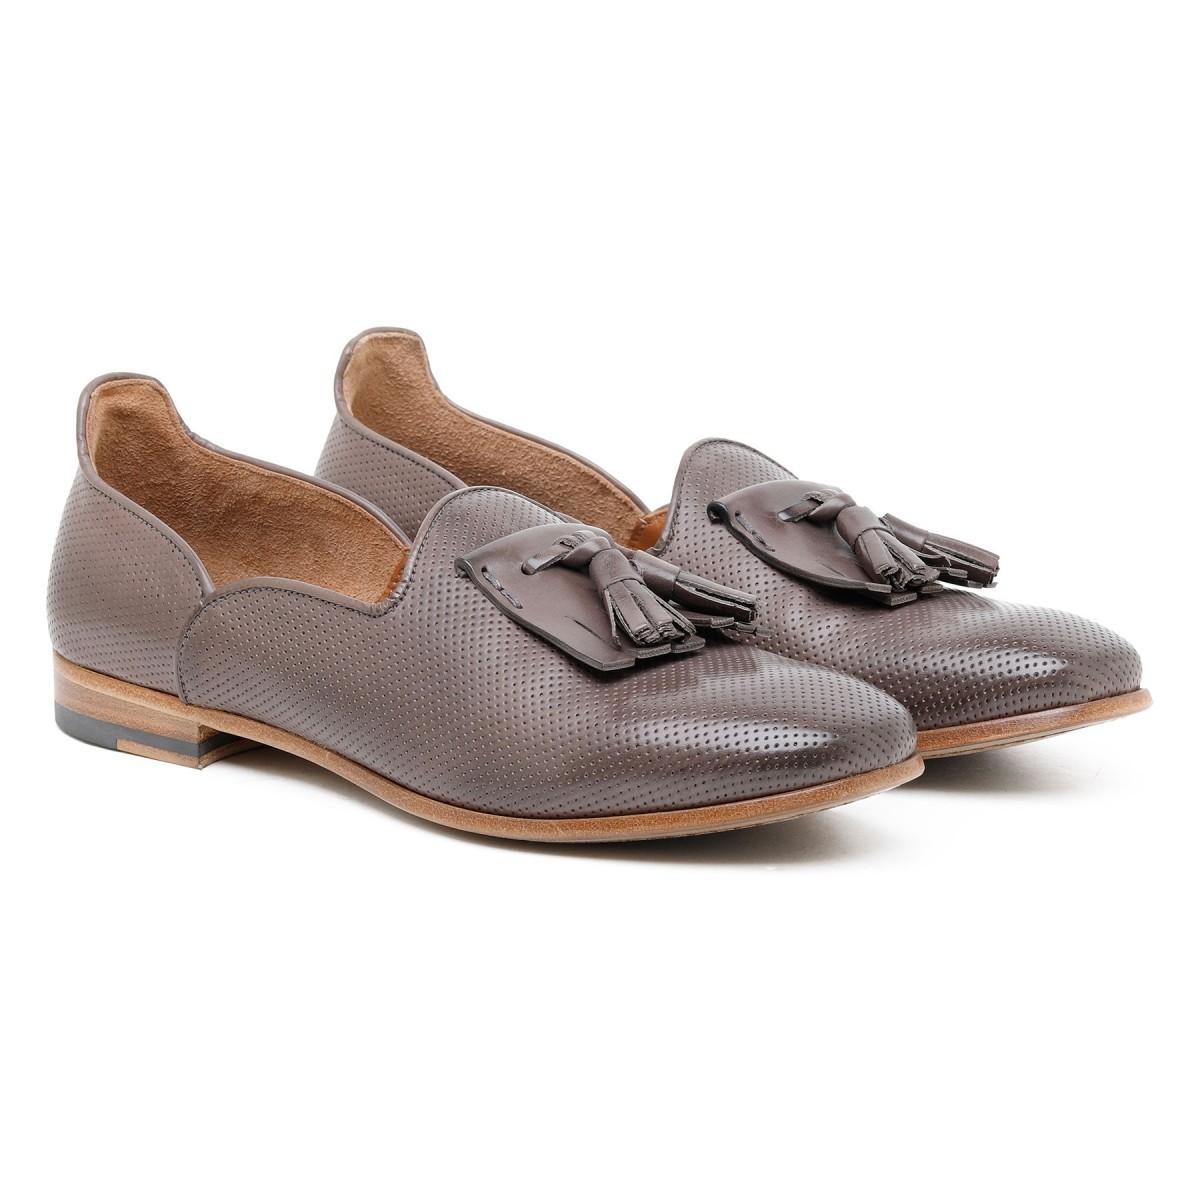 Slippers in pelle marrone con nappine